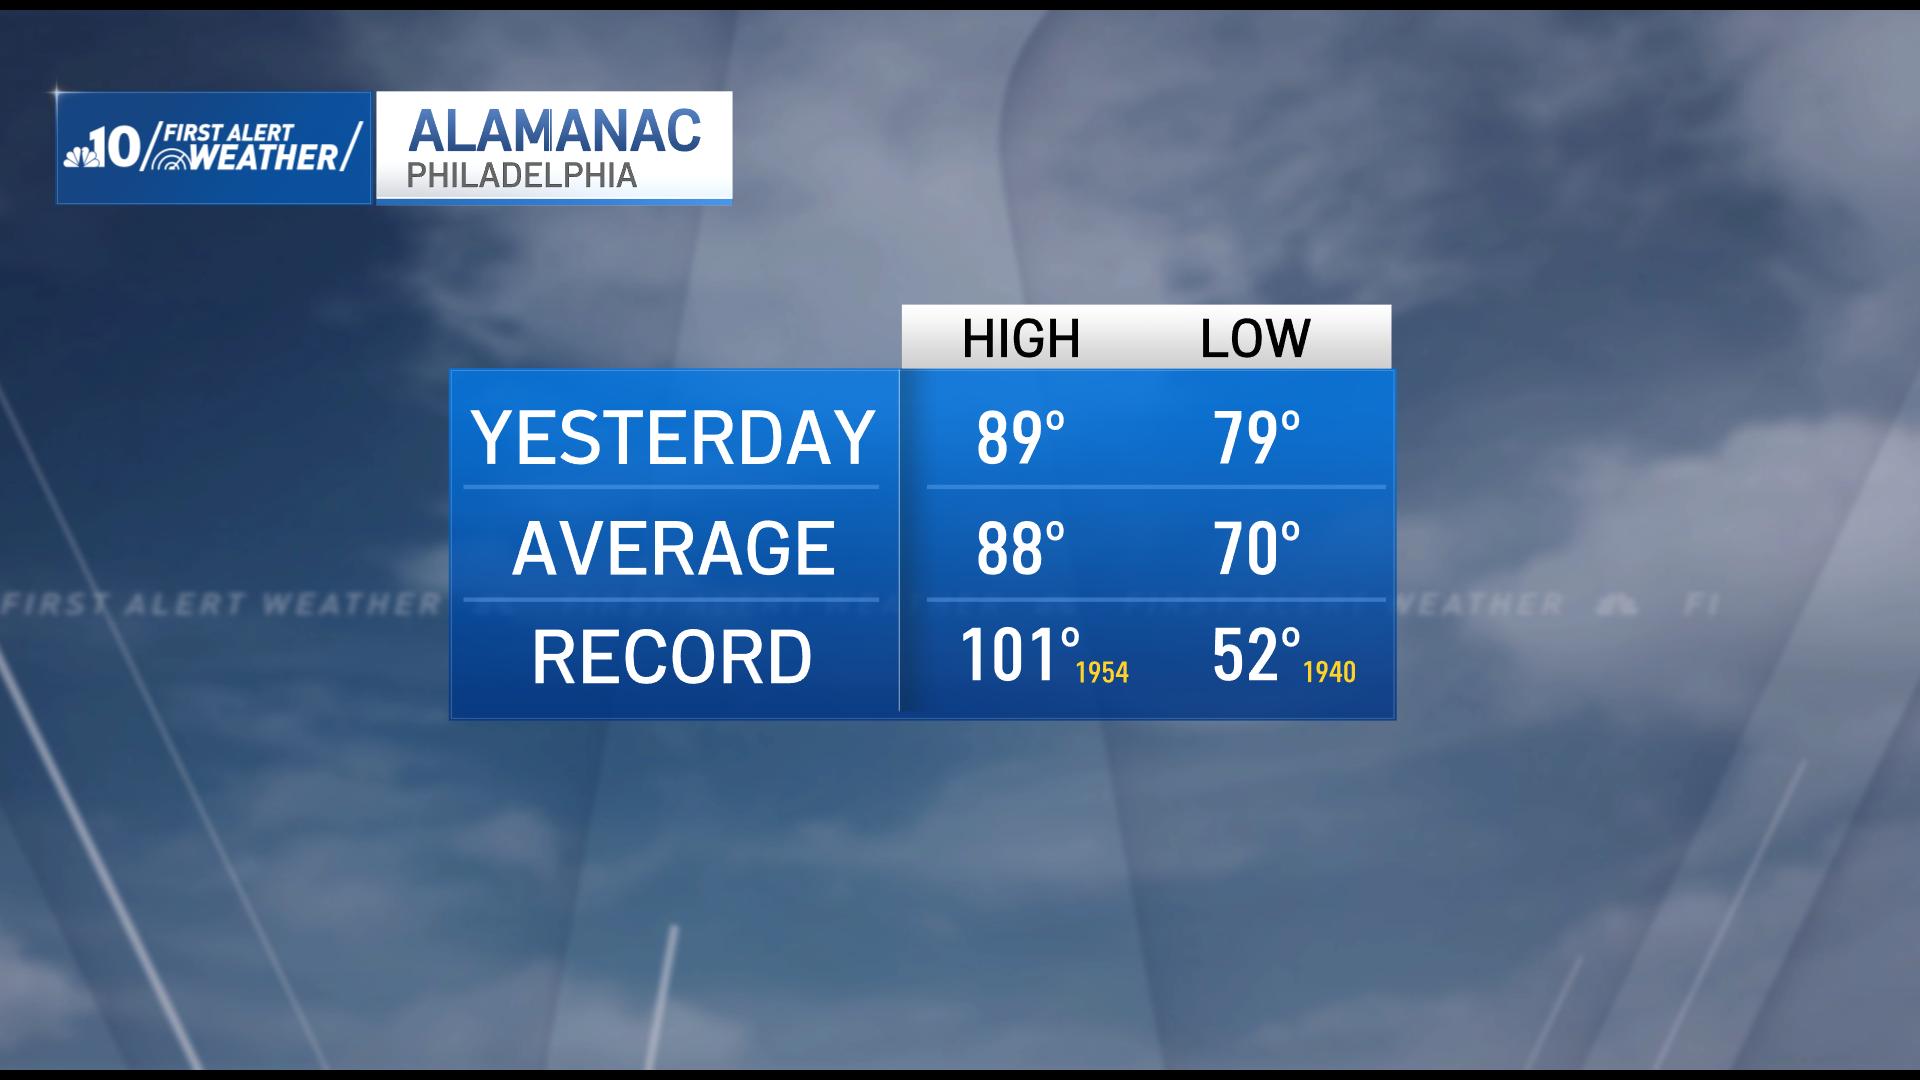 Daily Almanac